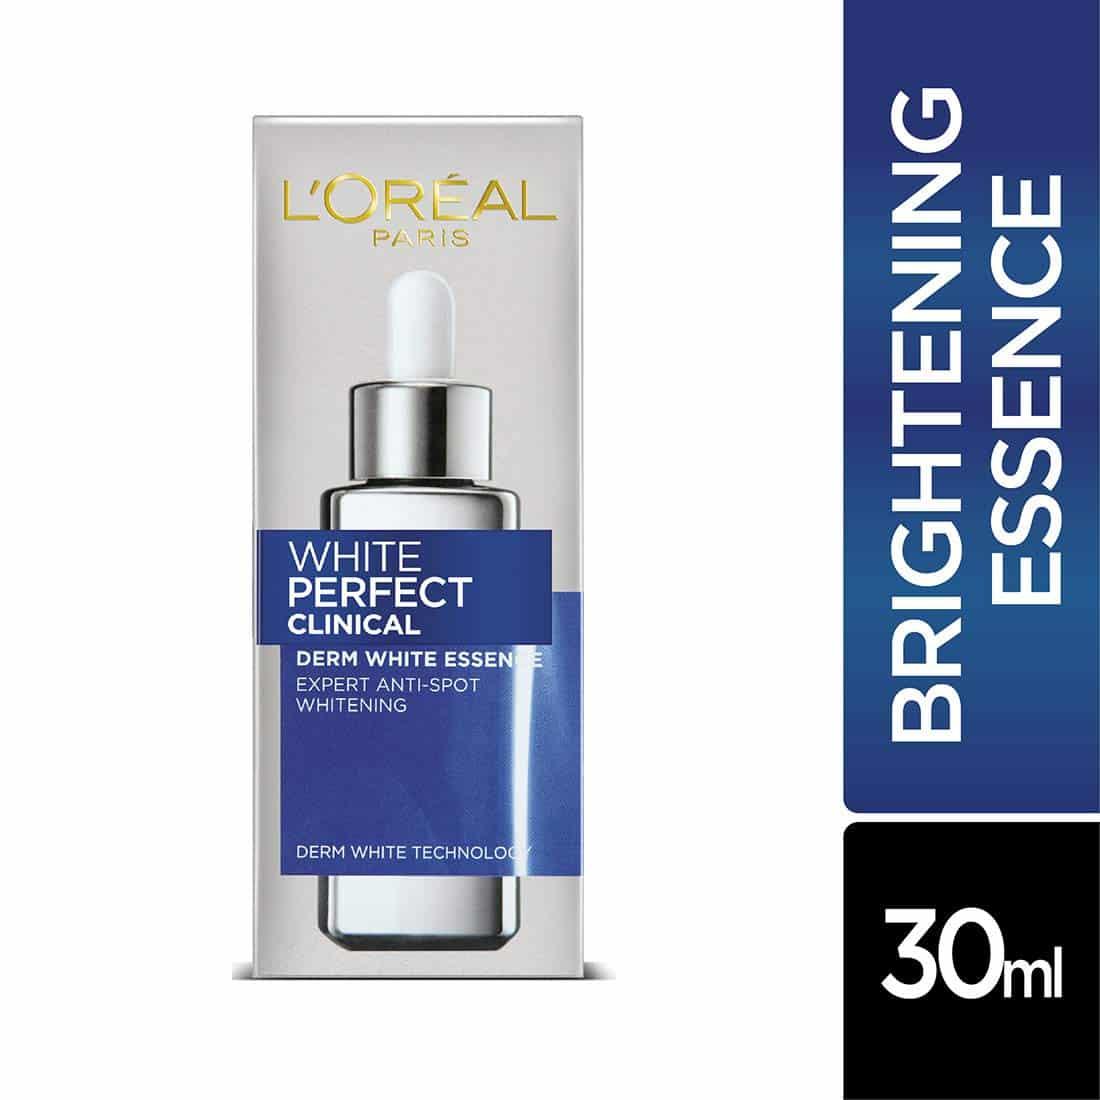 LOreal-Paris-White-Perfect-Clinical-Derm-White-Essence